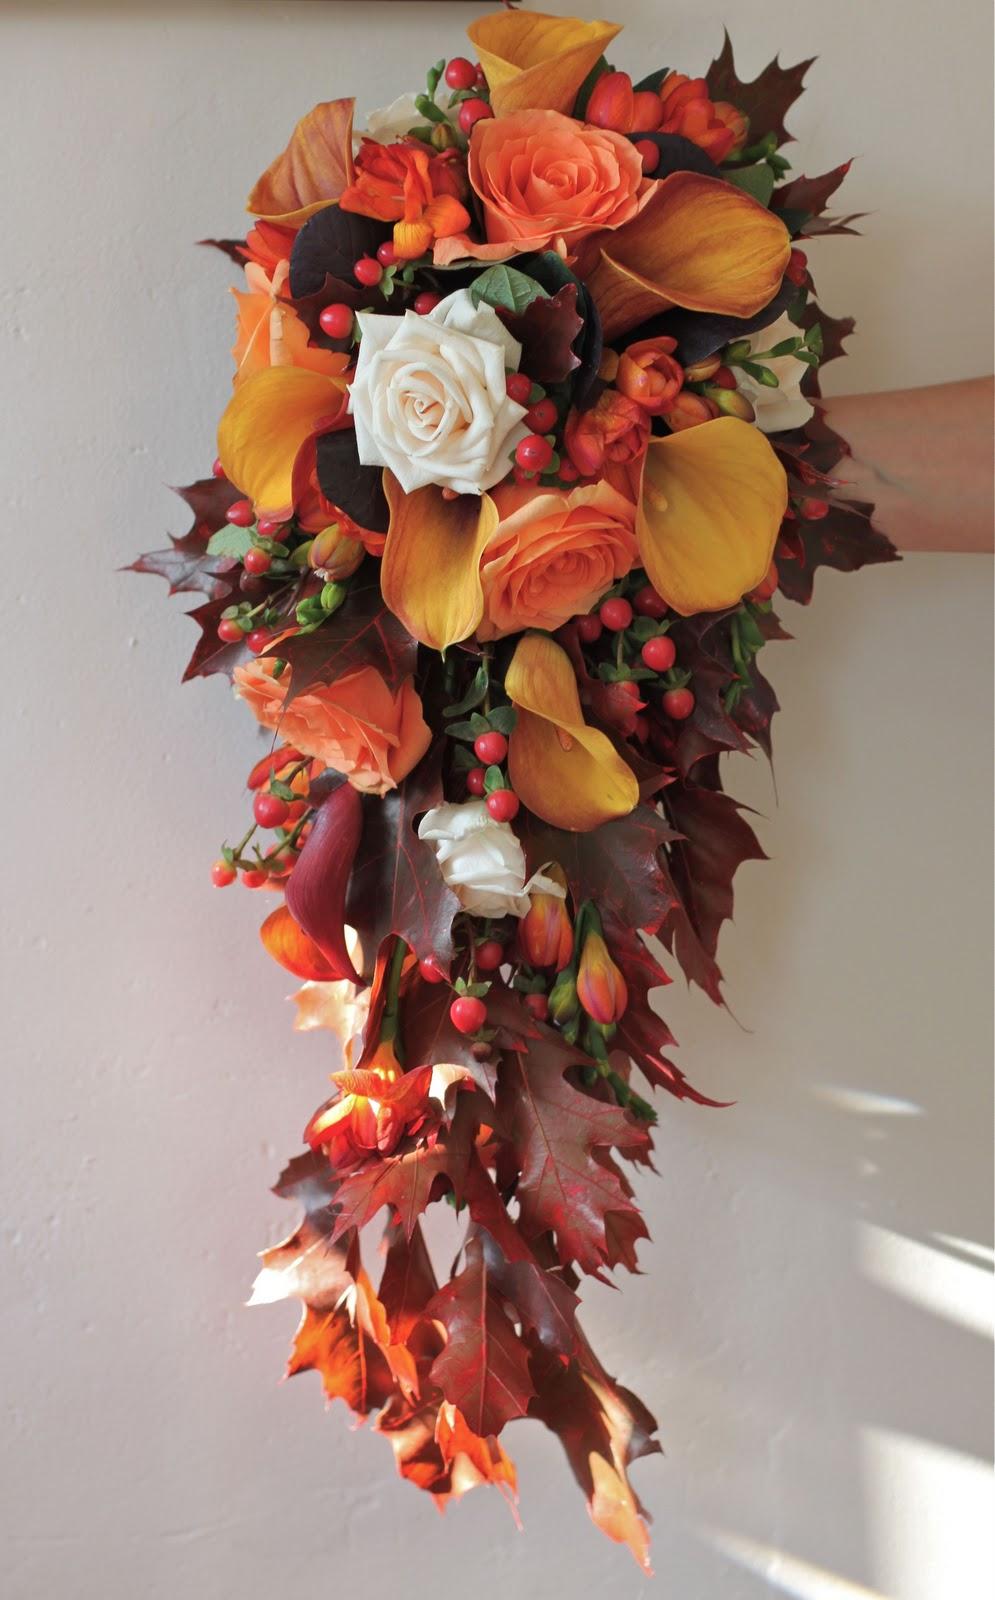 Wedding Flowers Blog: Alison's Autumn Wedding Flowers ...